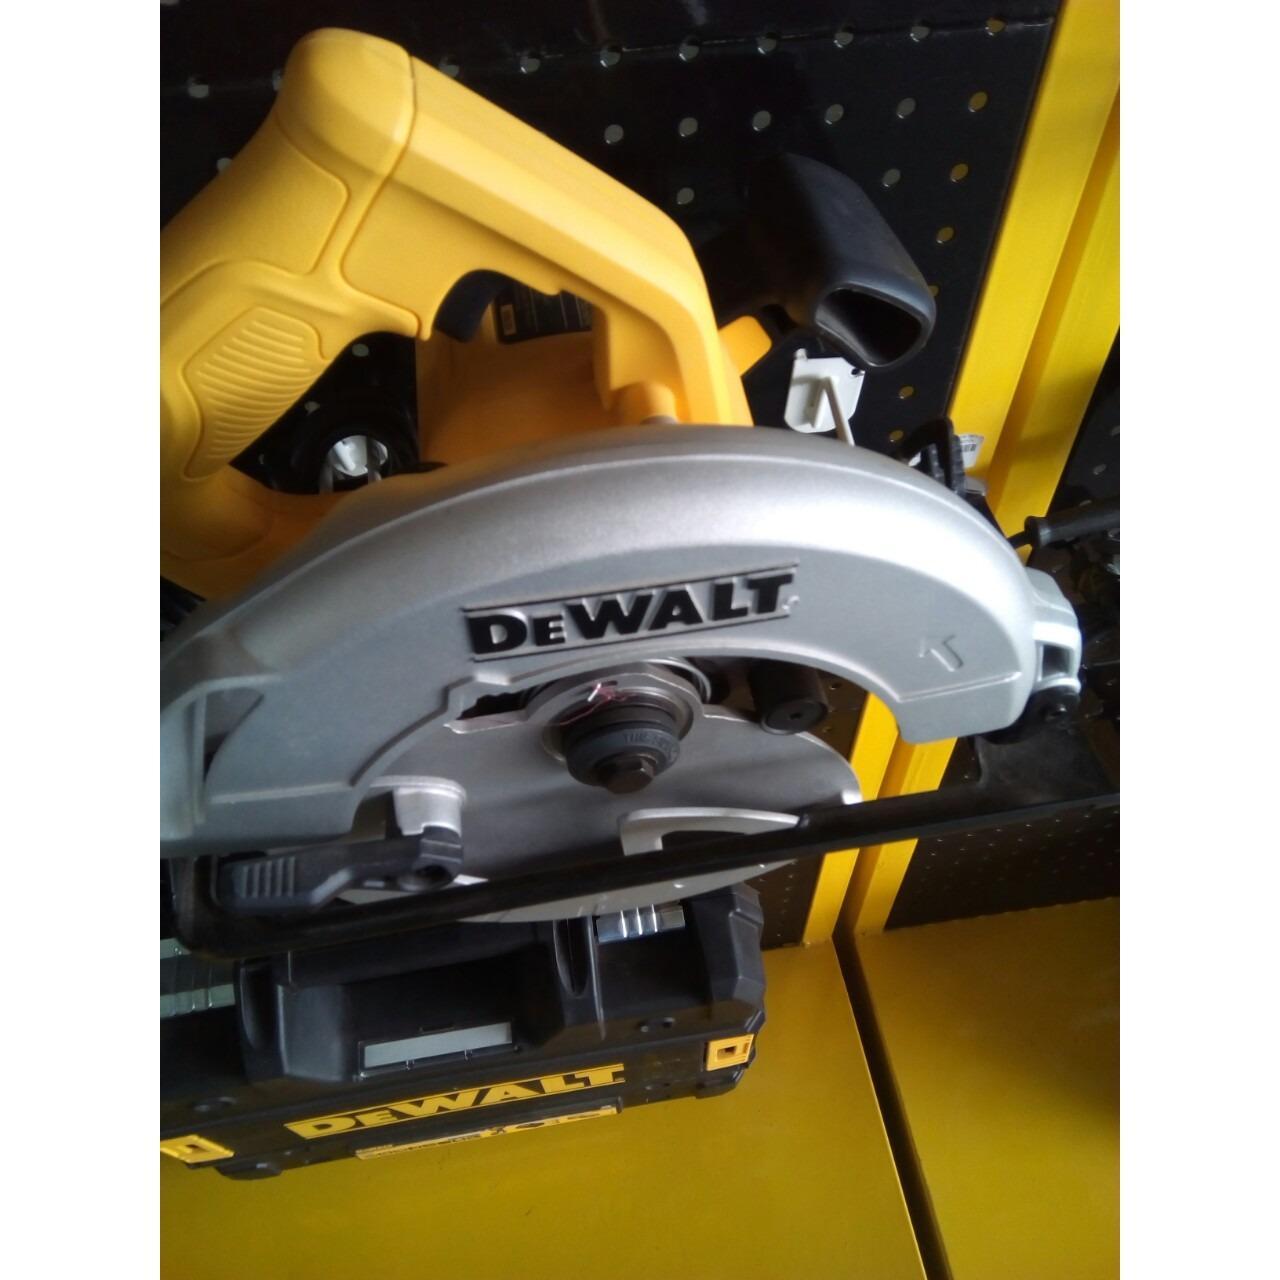 Máy Cưa Đĩa DWE561-DEWALT-220-240V~ 50/60Hz-1200W